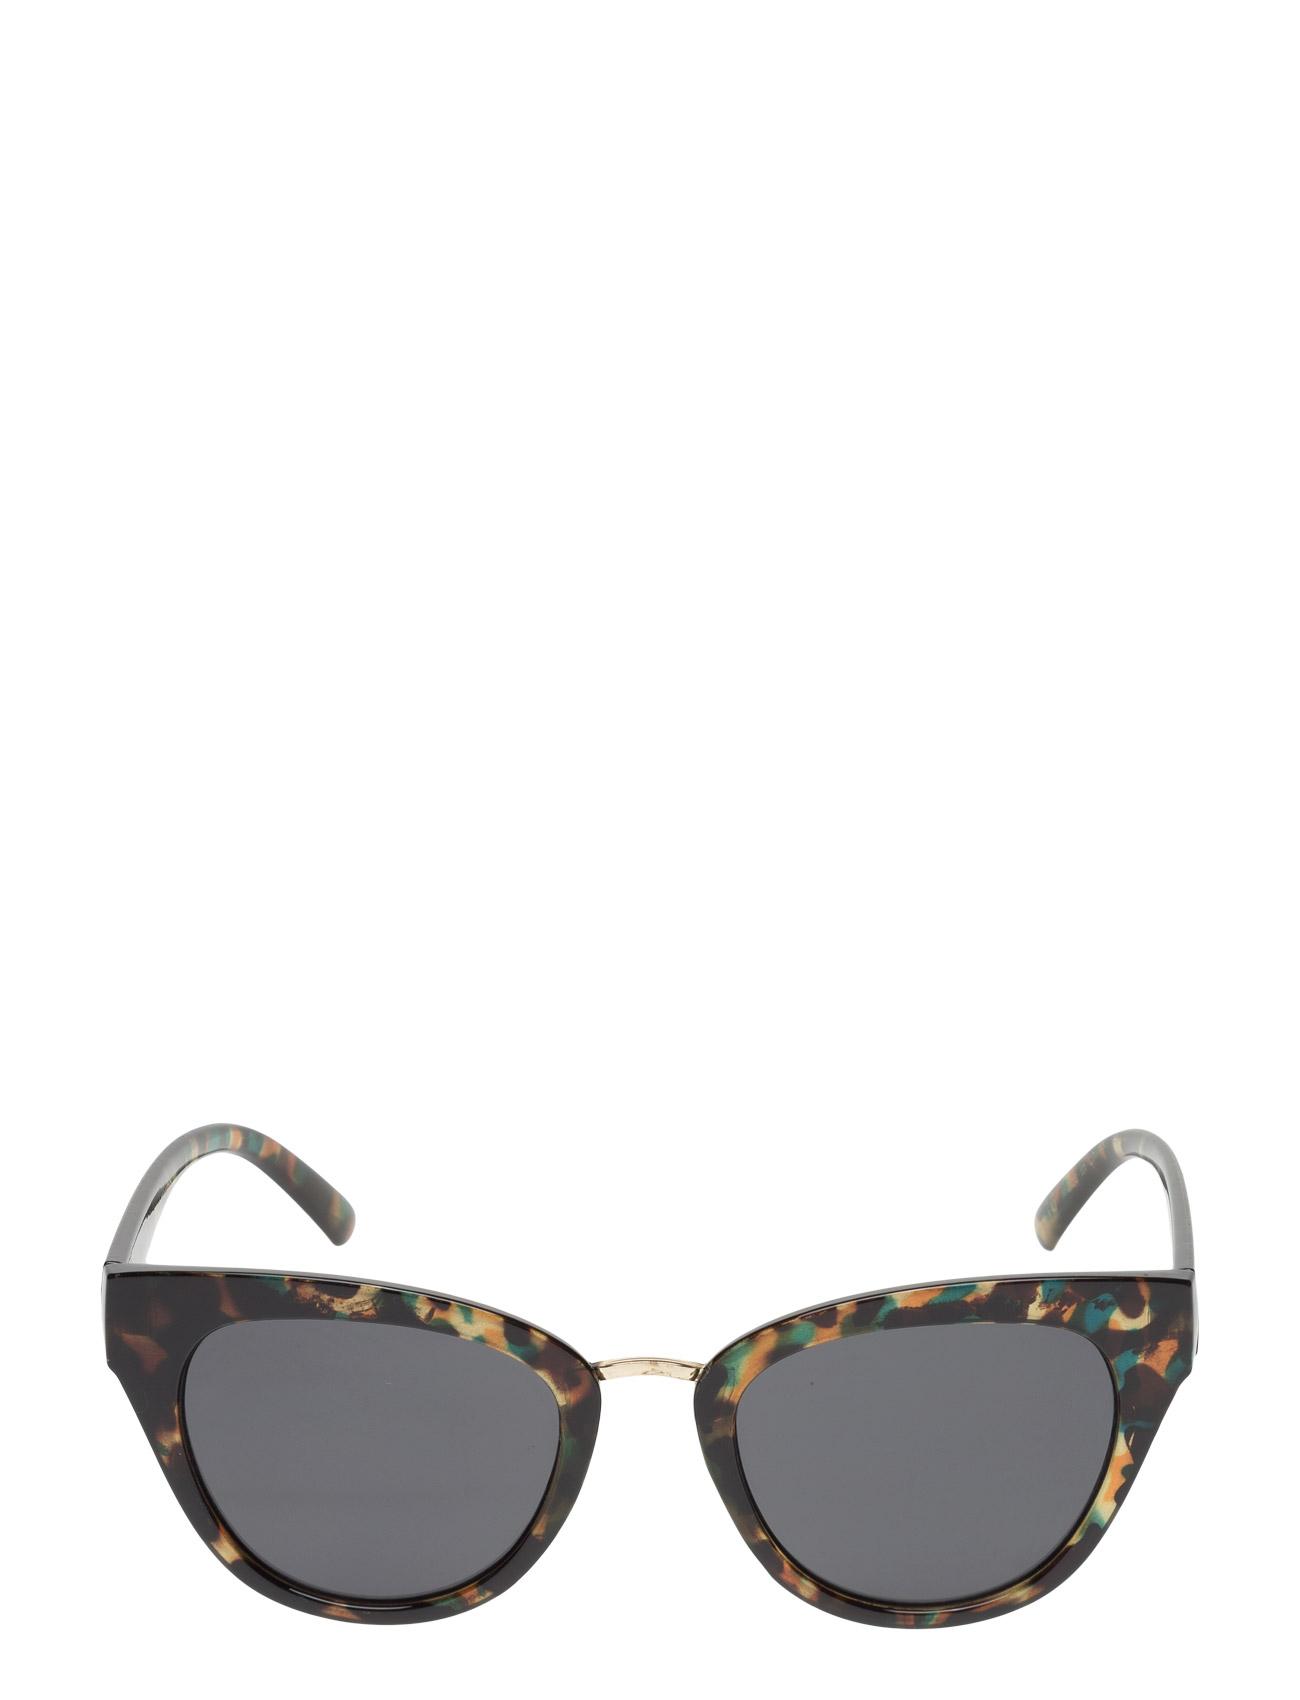 Retro Style Sunglasses Mango Solbriller til Kvinder i